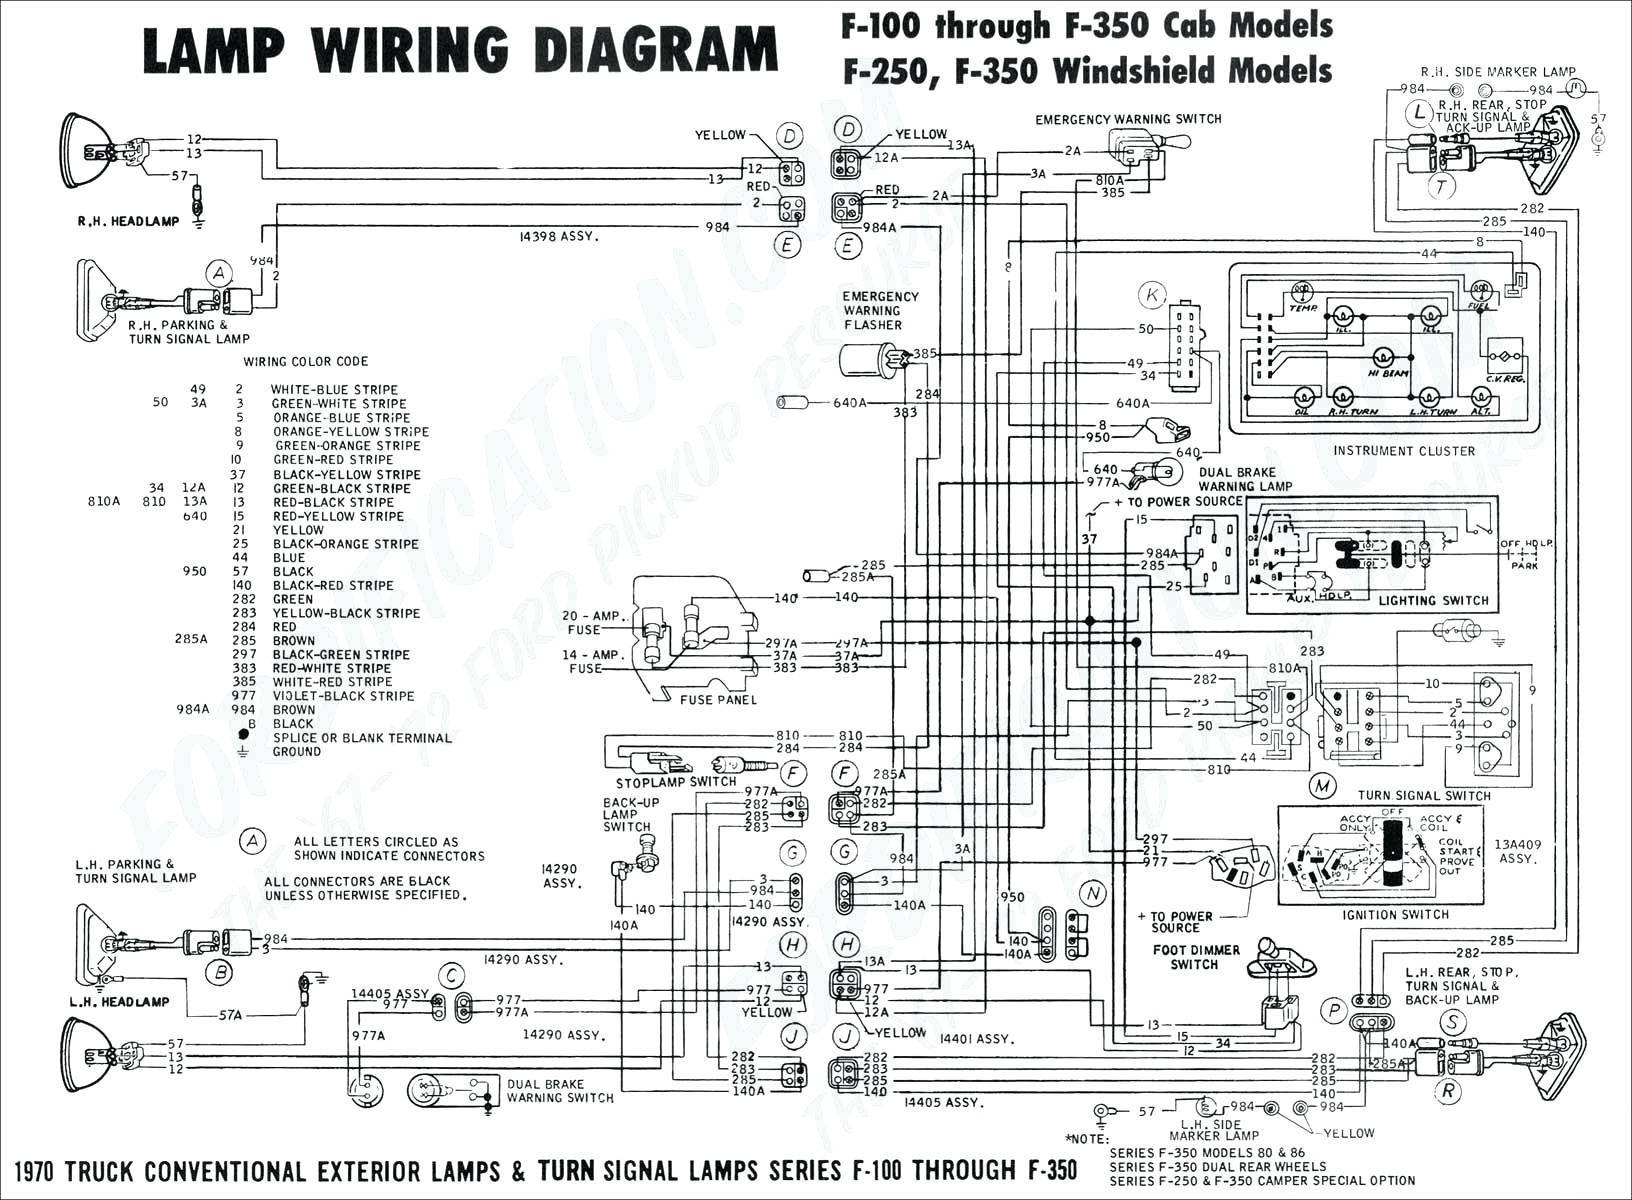 Ohc Engine Diagram Dohc Cb750 Wire Diagram Experts Wiring Diagram • Of Ohc Engine Diagram